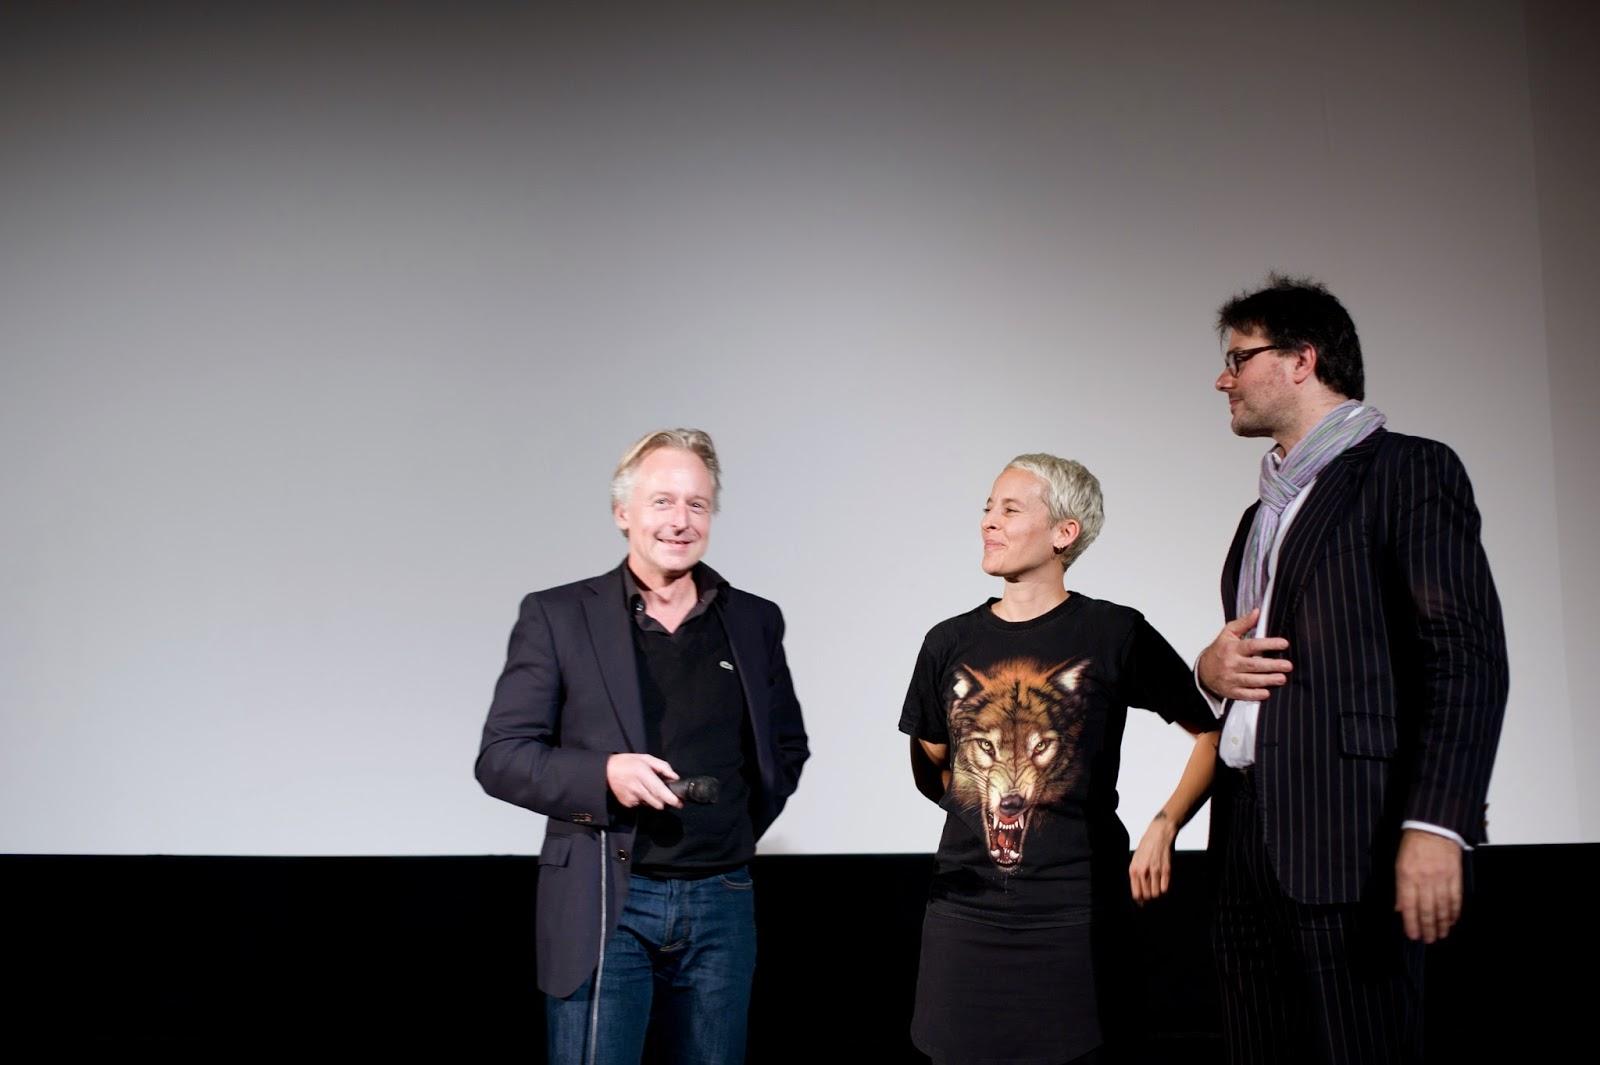 on stage: Olaf Stüber, Candice Breitz, Ivo Wessel